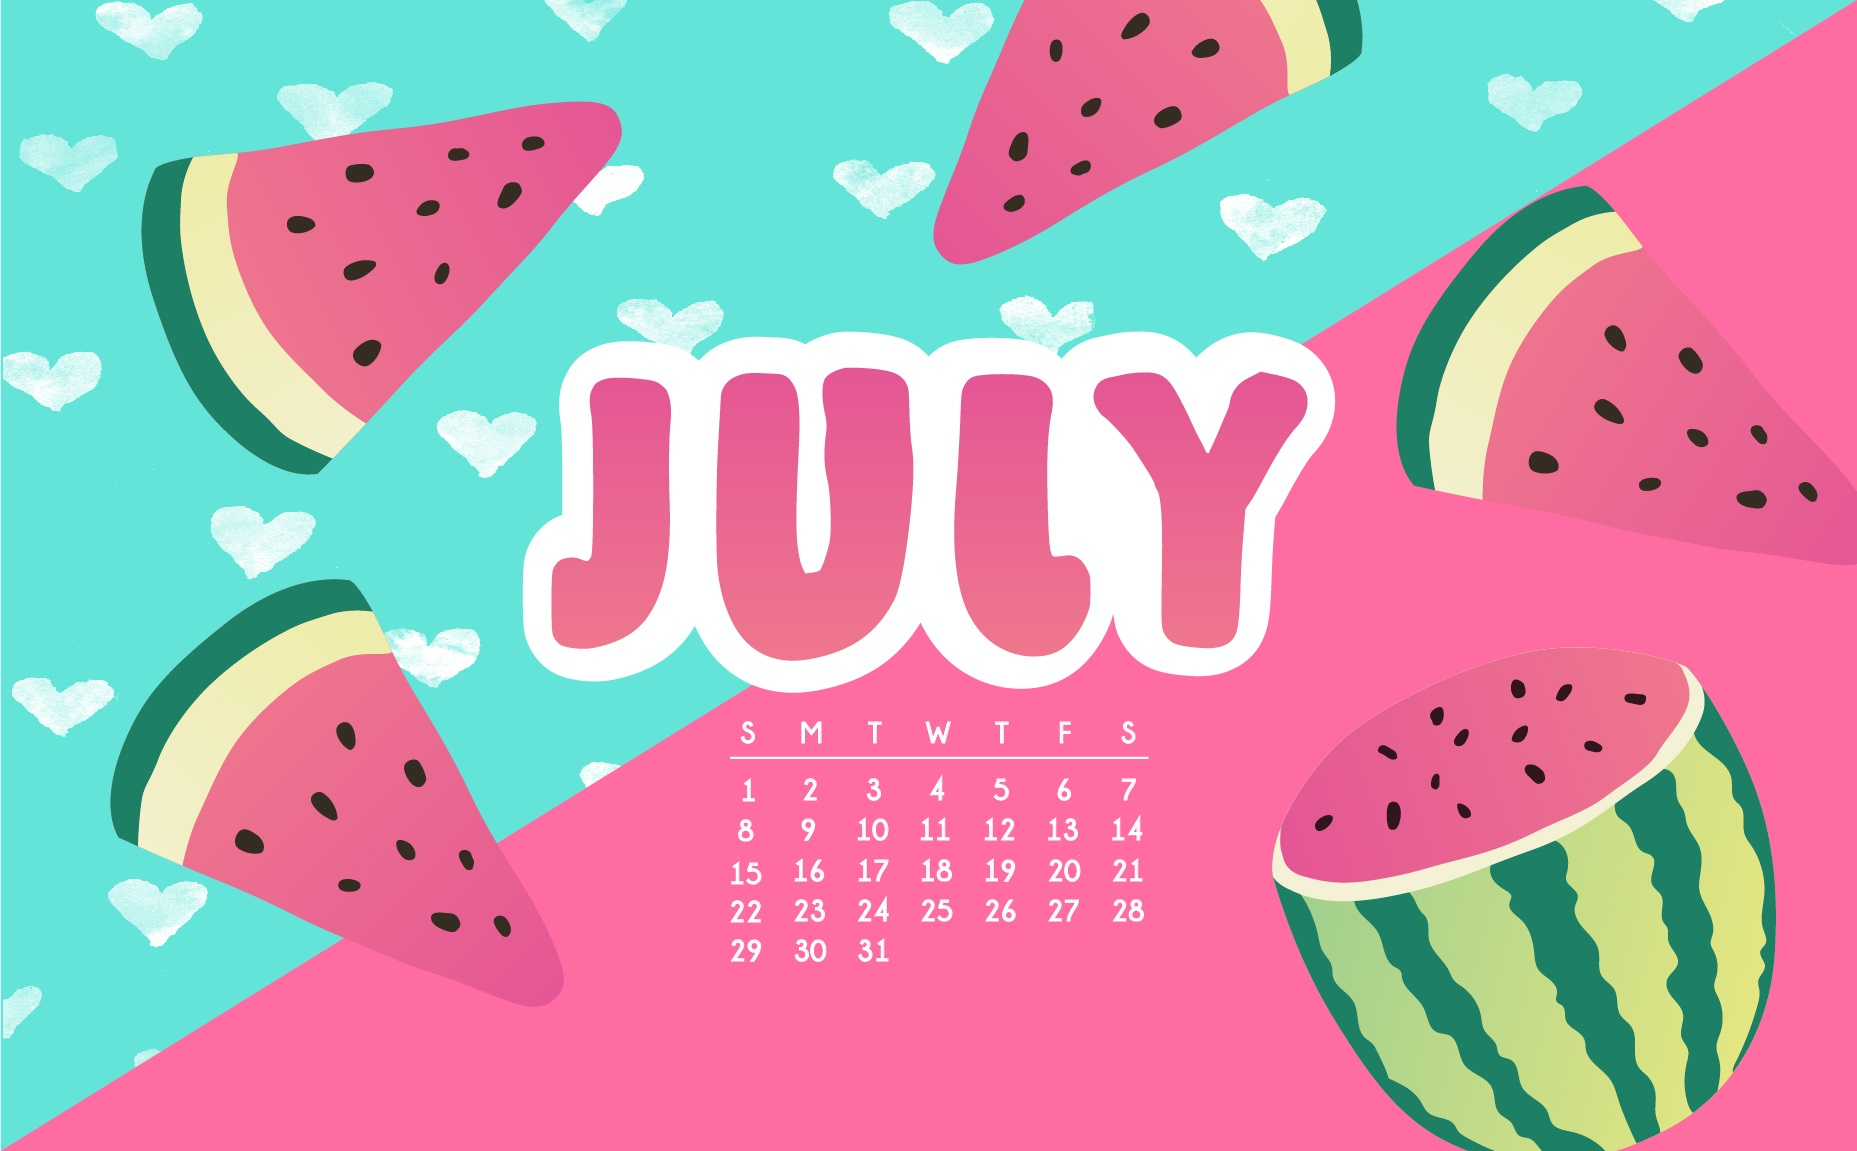 July 2018 Calendar Wallpapers Max Calendars 1857x1151